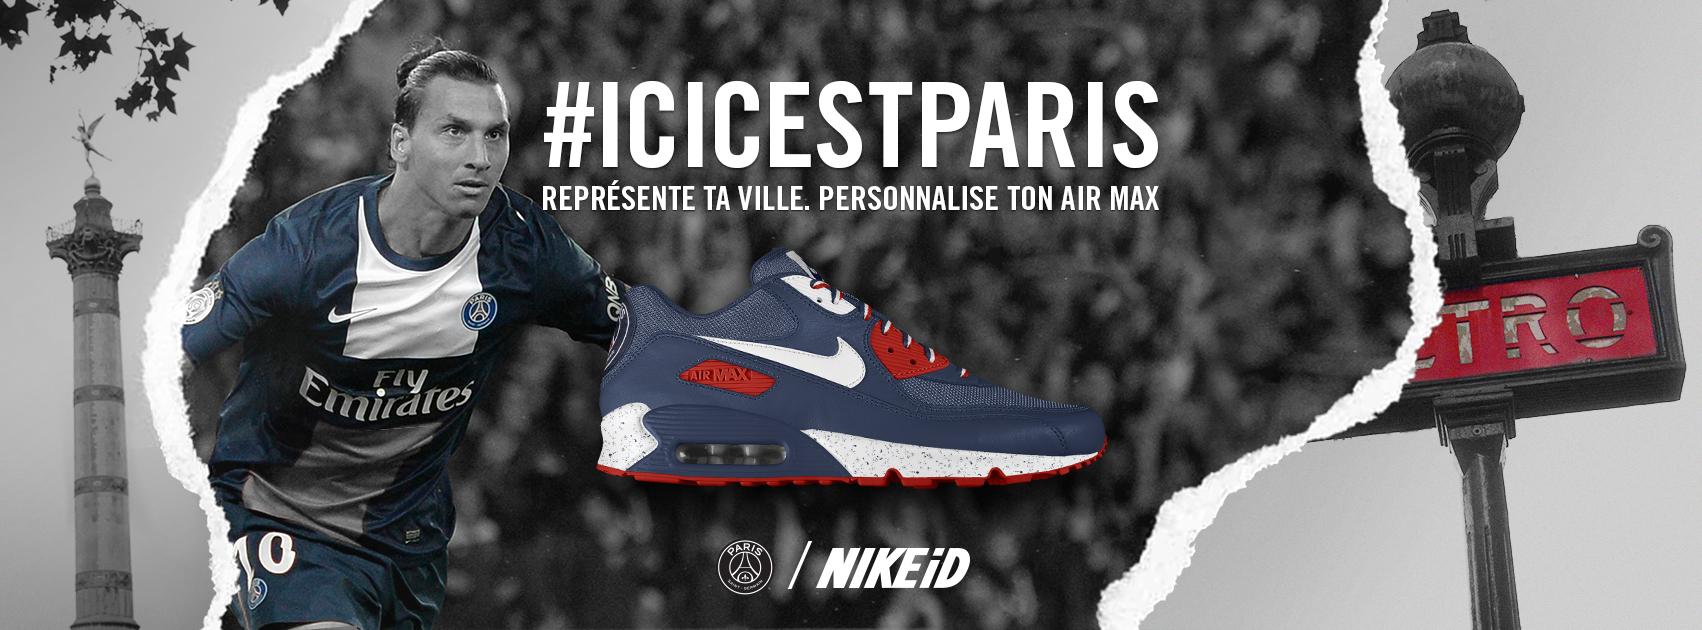 Icicestparis Paris Max Saint Germain Nike Air Max Paris 90 cda421